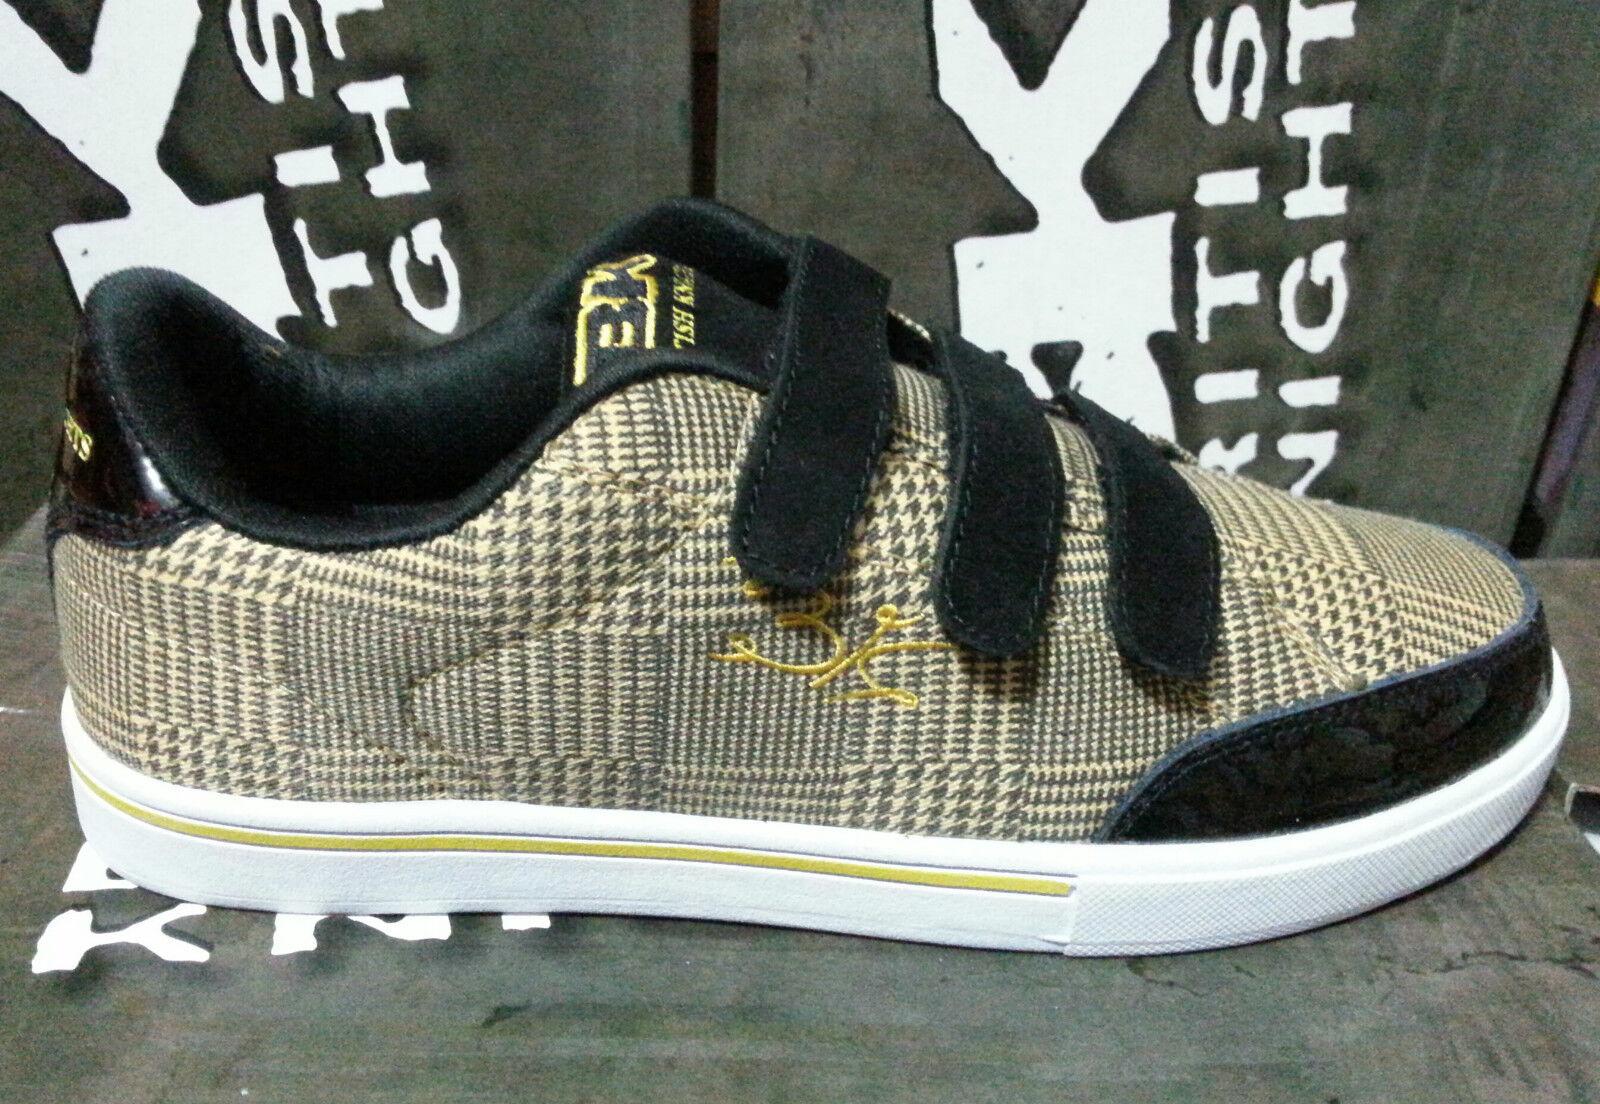 BK British Knights Schuhe Turnschuhe Tyrax Gelb Gelb Lack